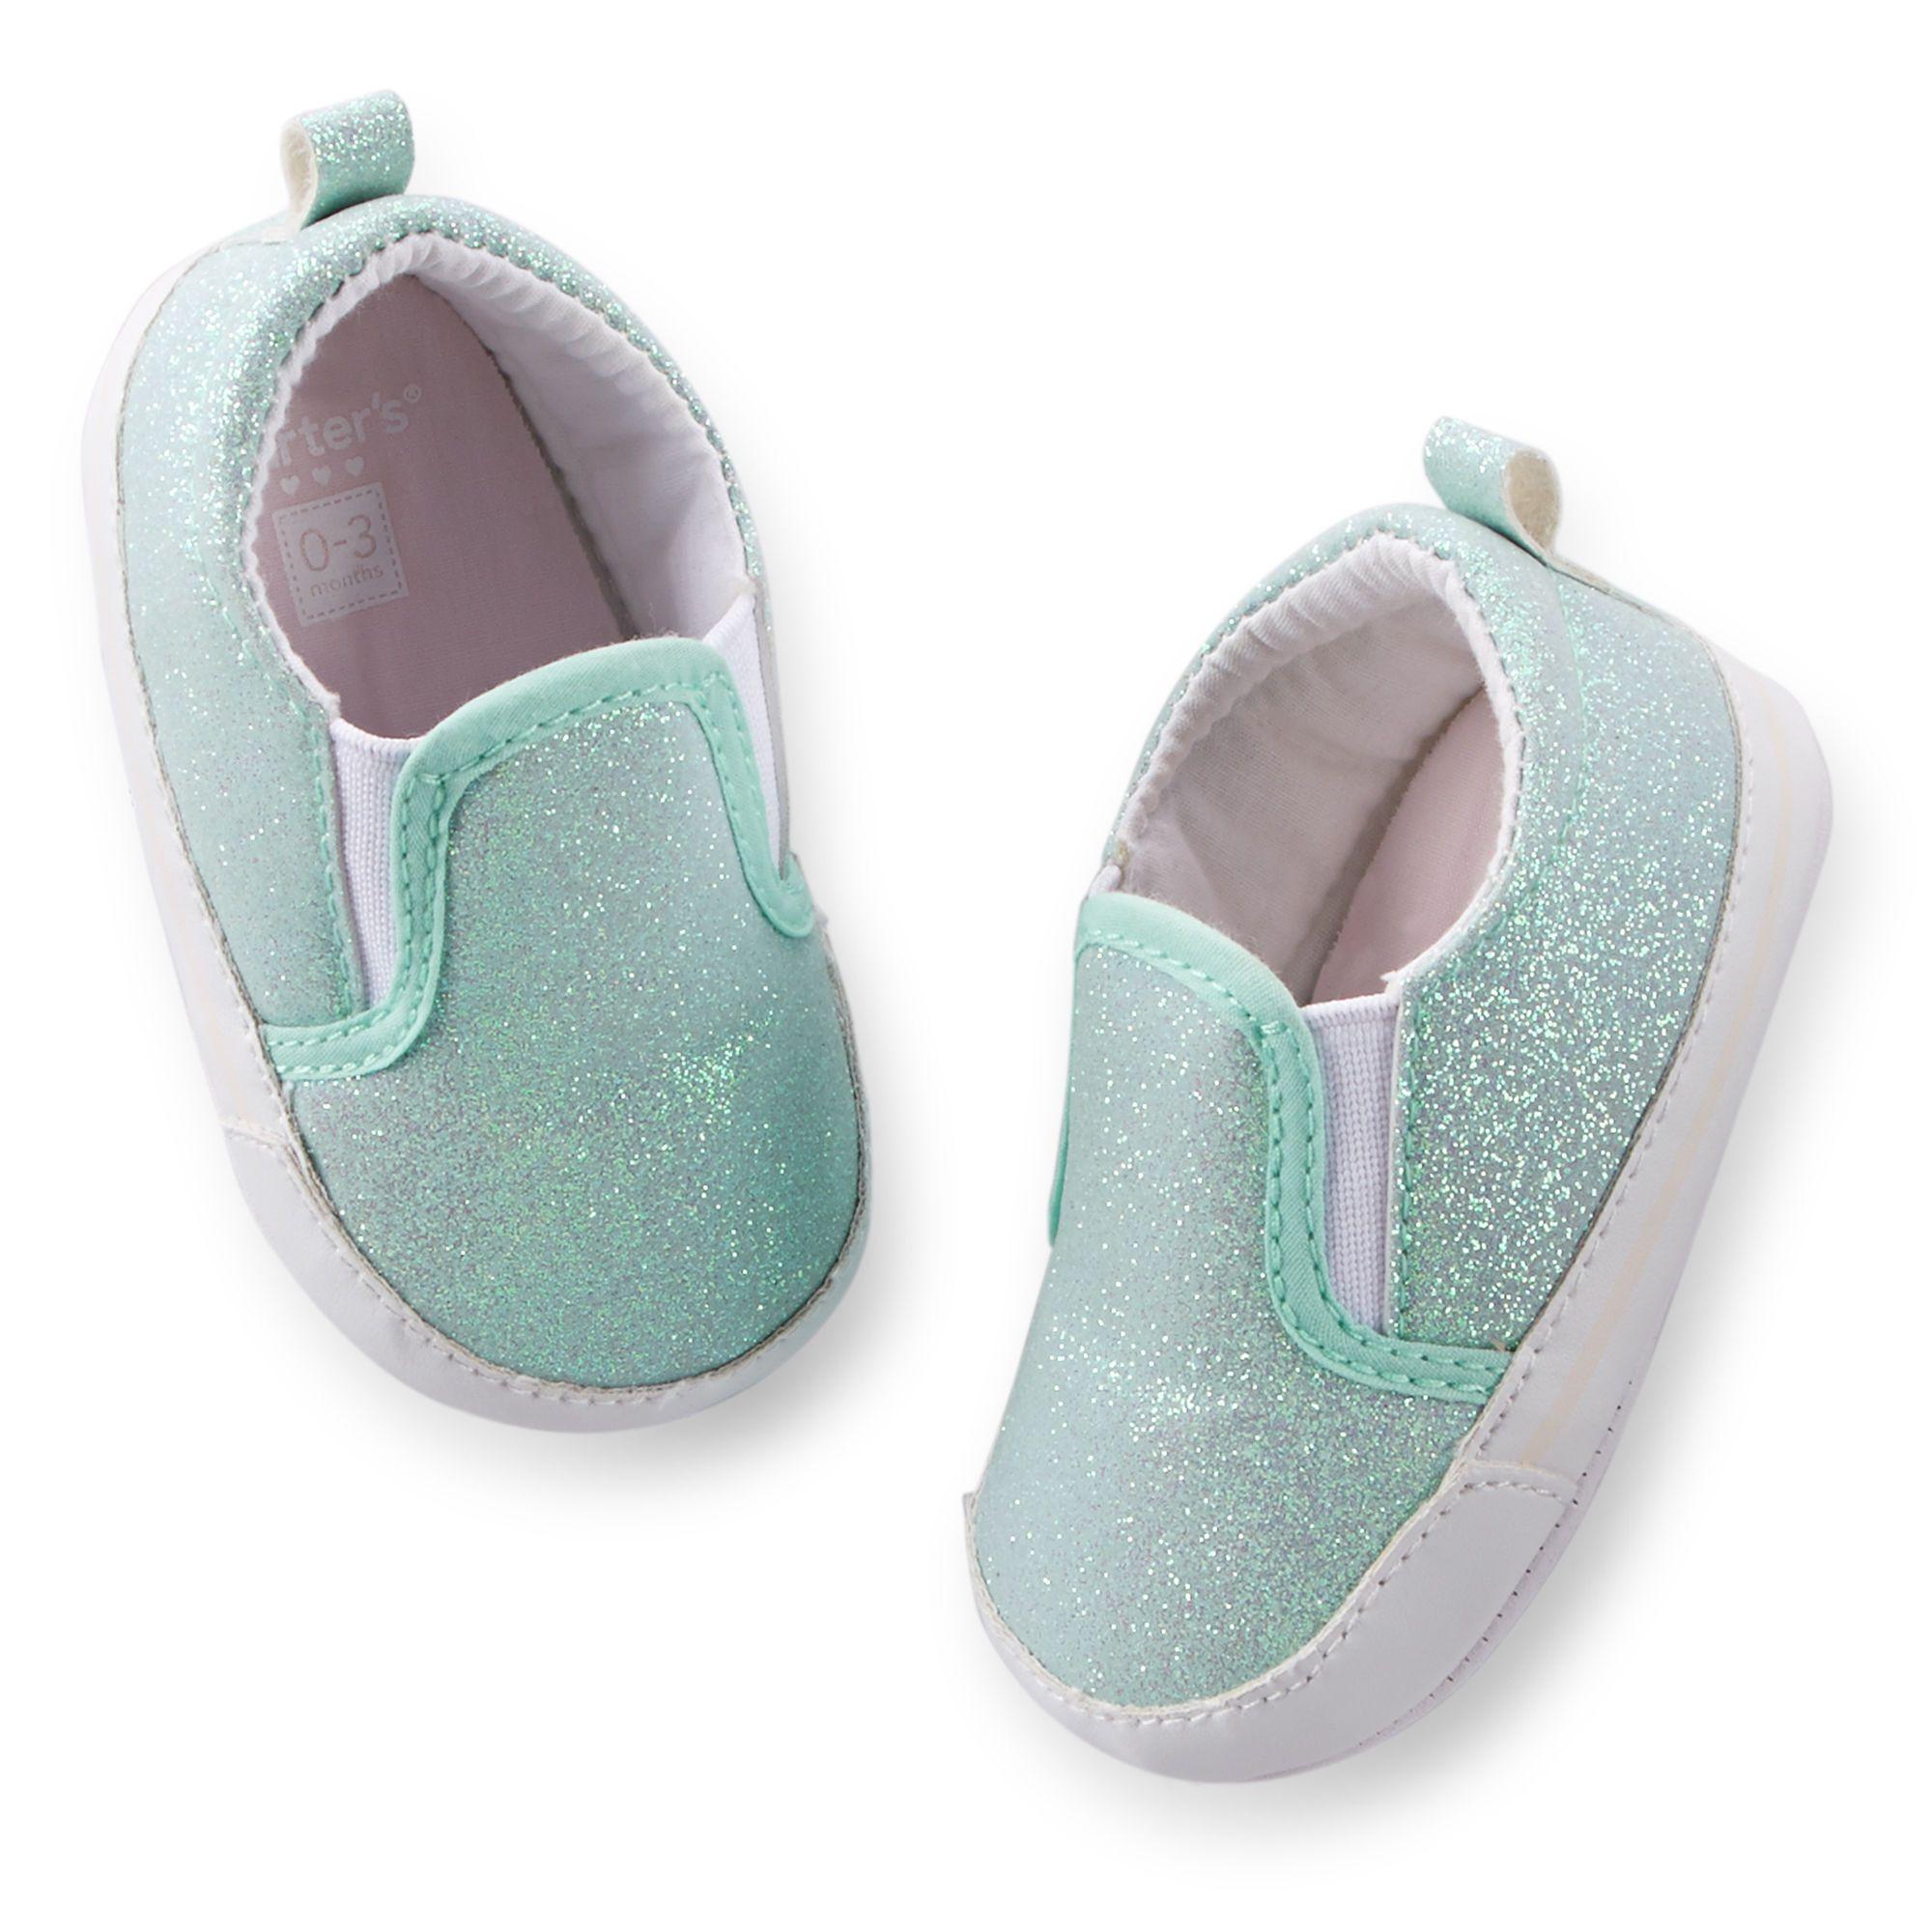 shoes c baby toms crib nordstrom cribs boy boys